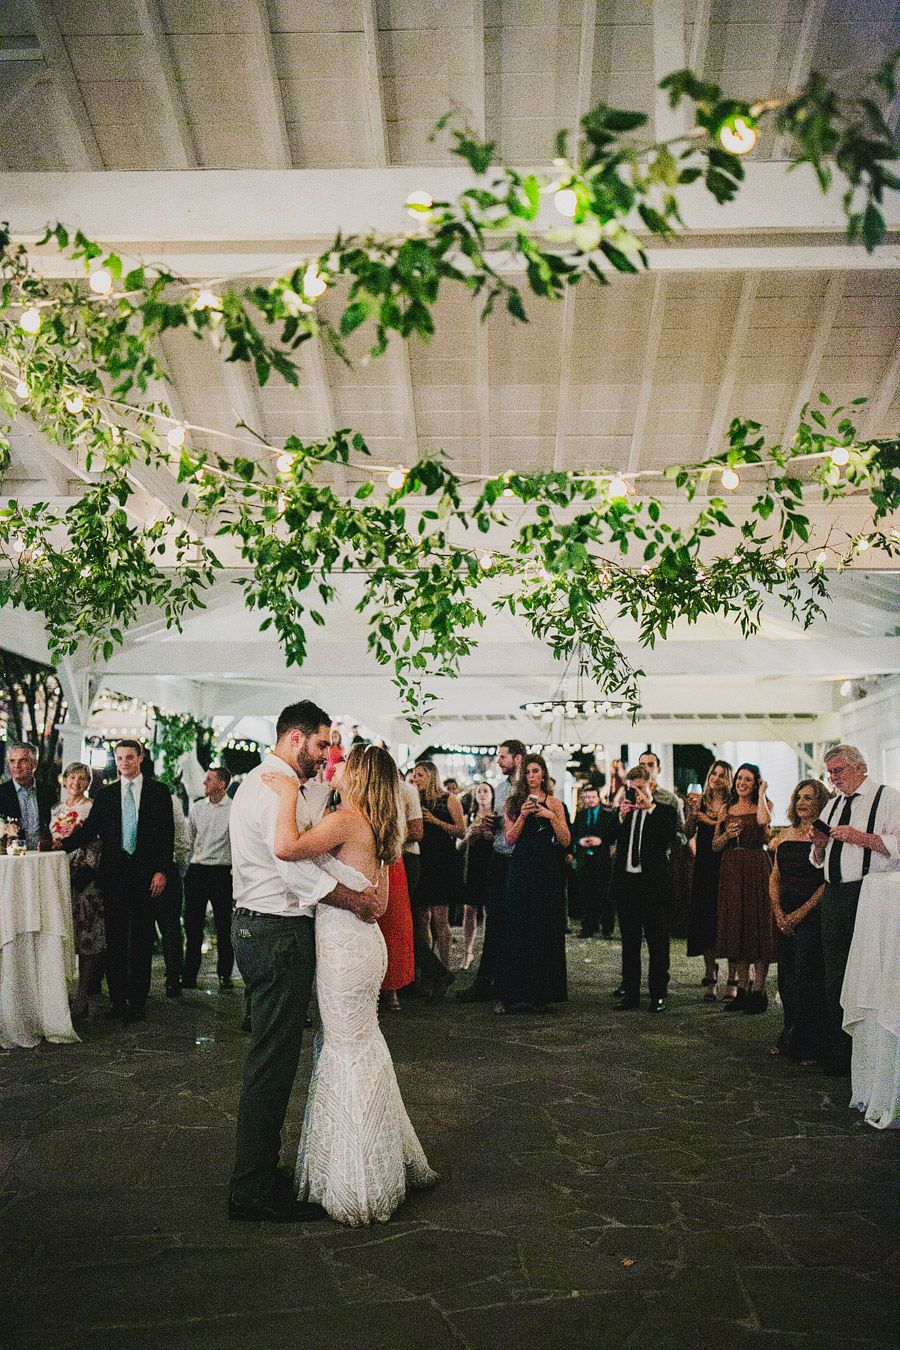 Becky David 09 17 2016 Pavilion Wedding Wedding Ceiling